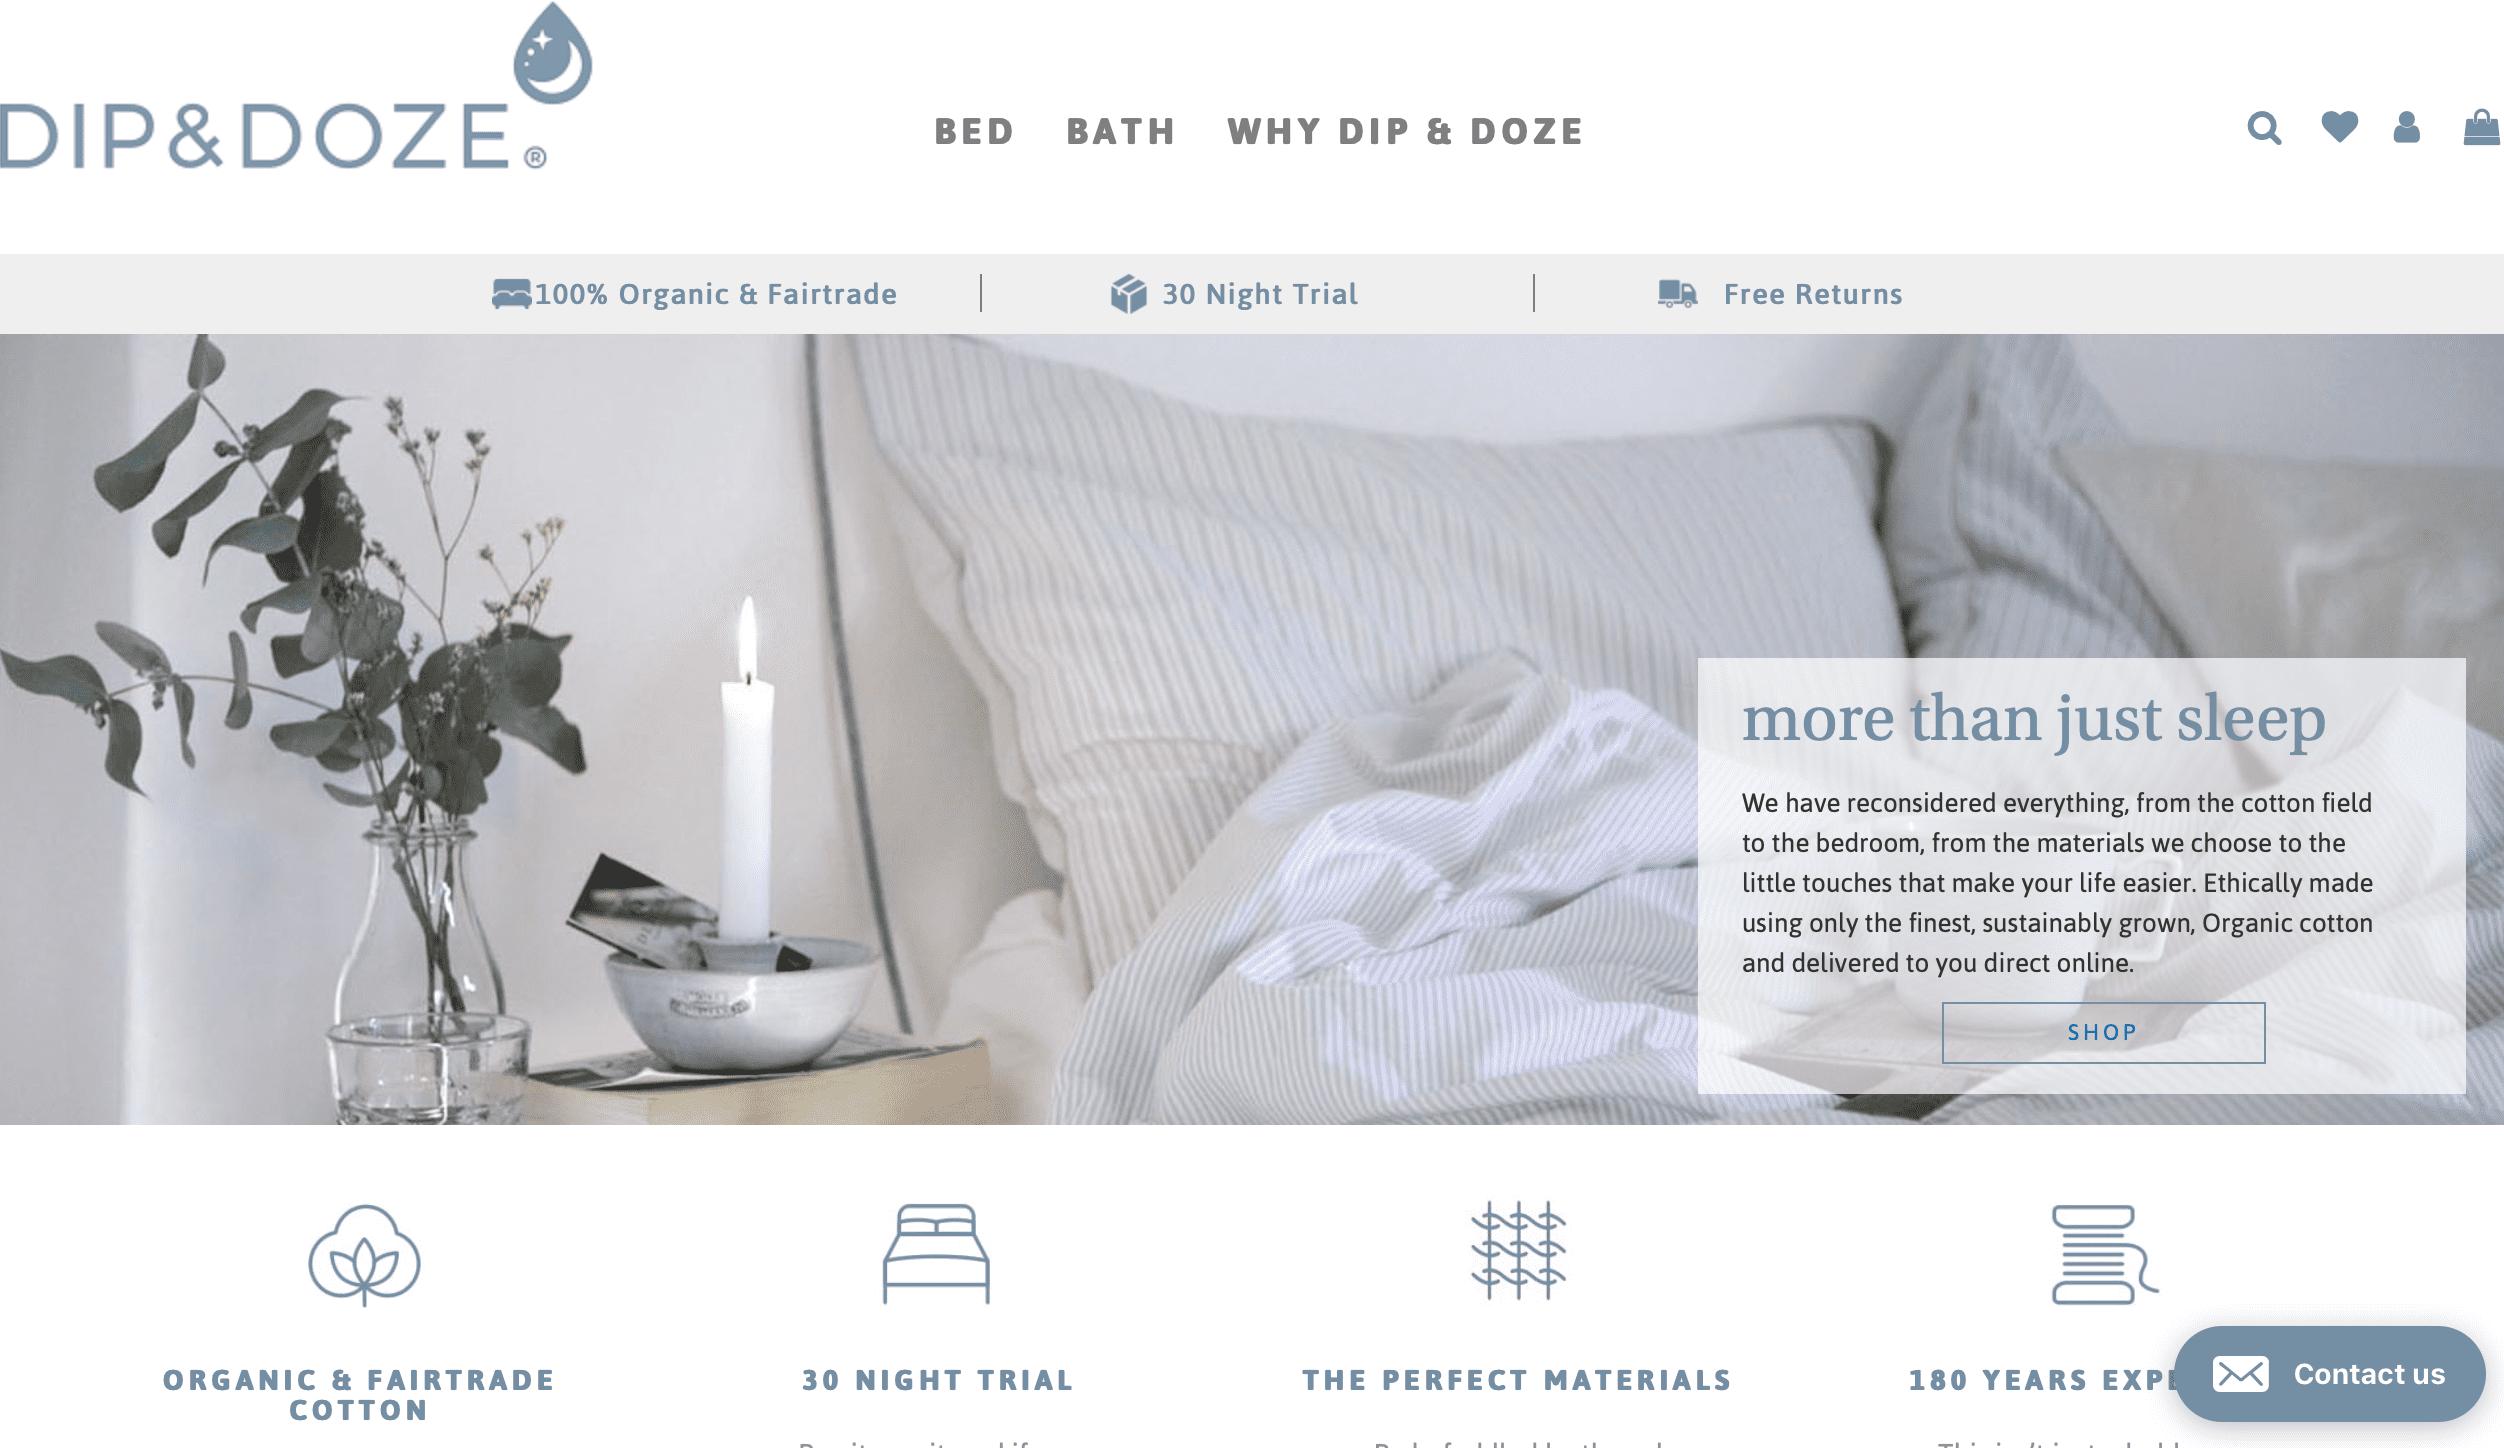 dip & doze website